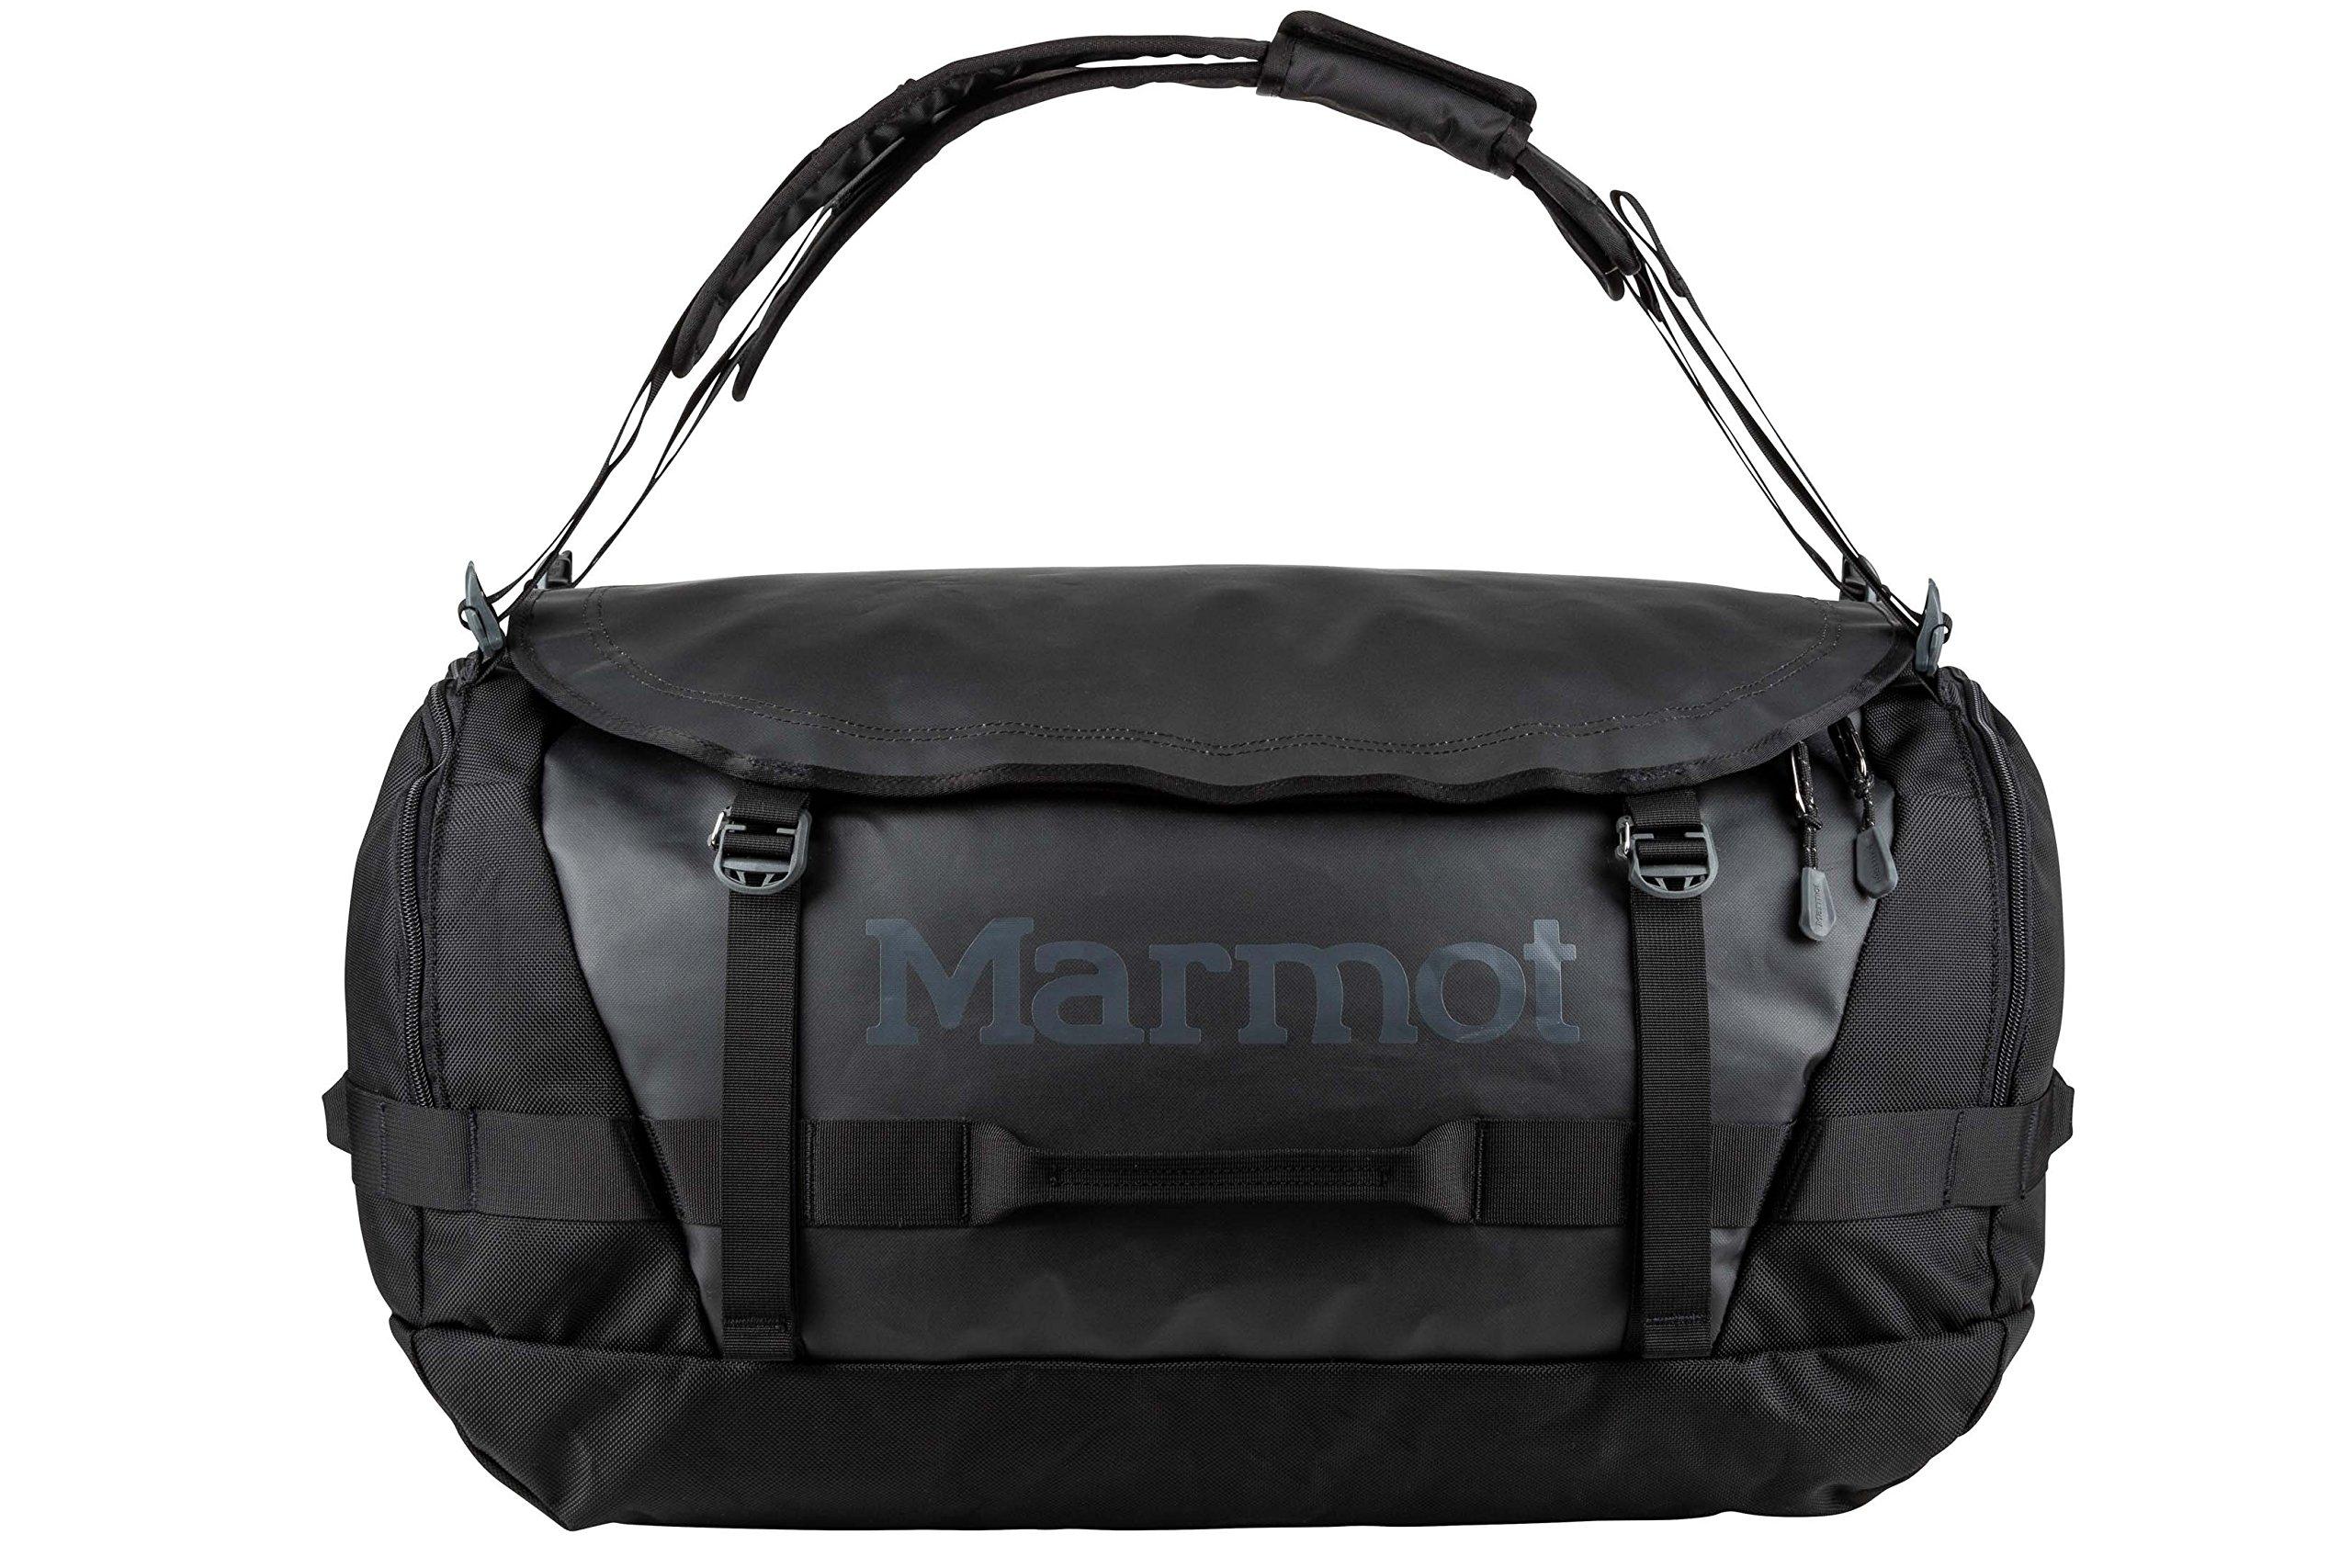 Marmot Long Hauler Large Travel Duffel Bag, 4575ci (75 liter)